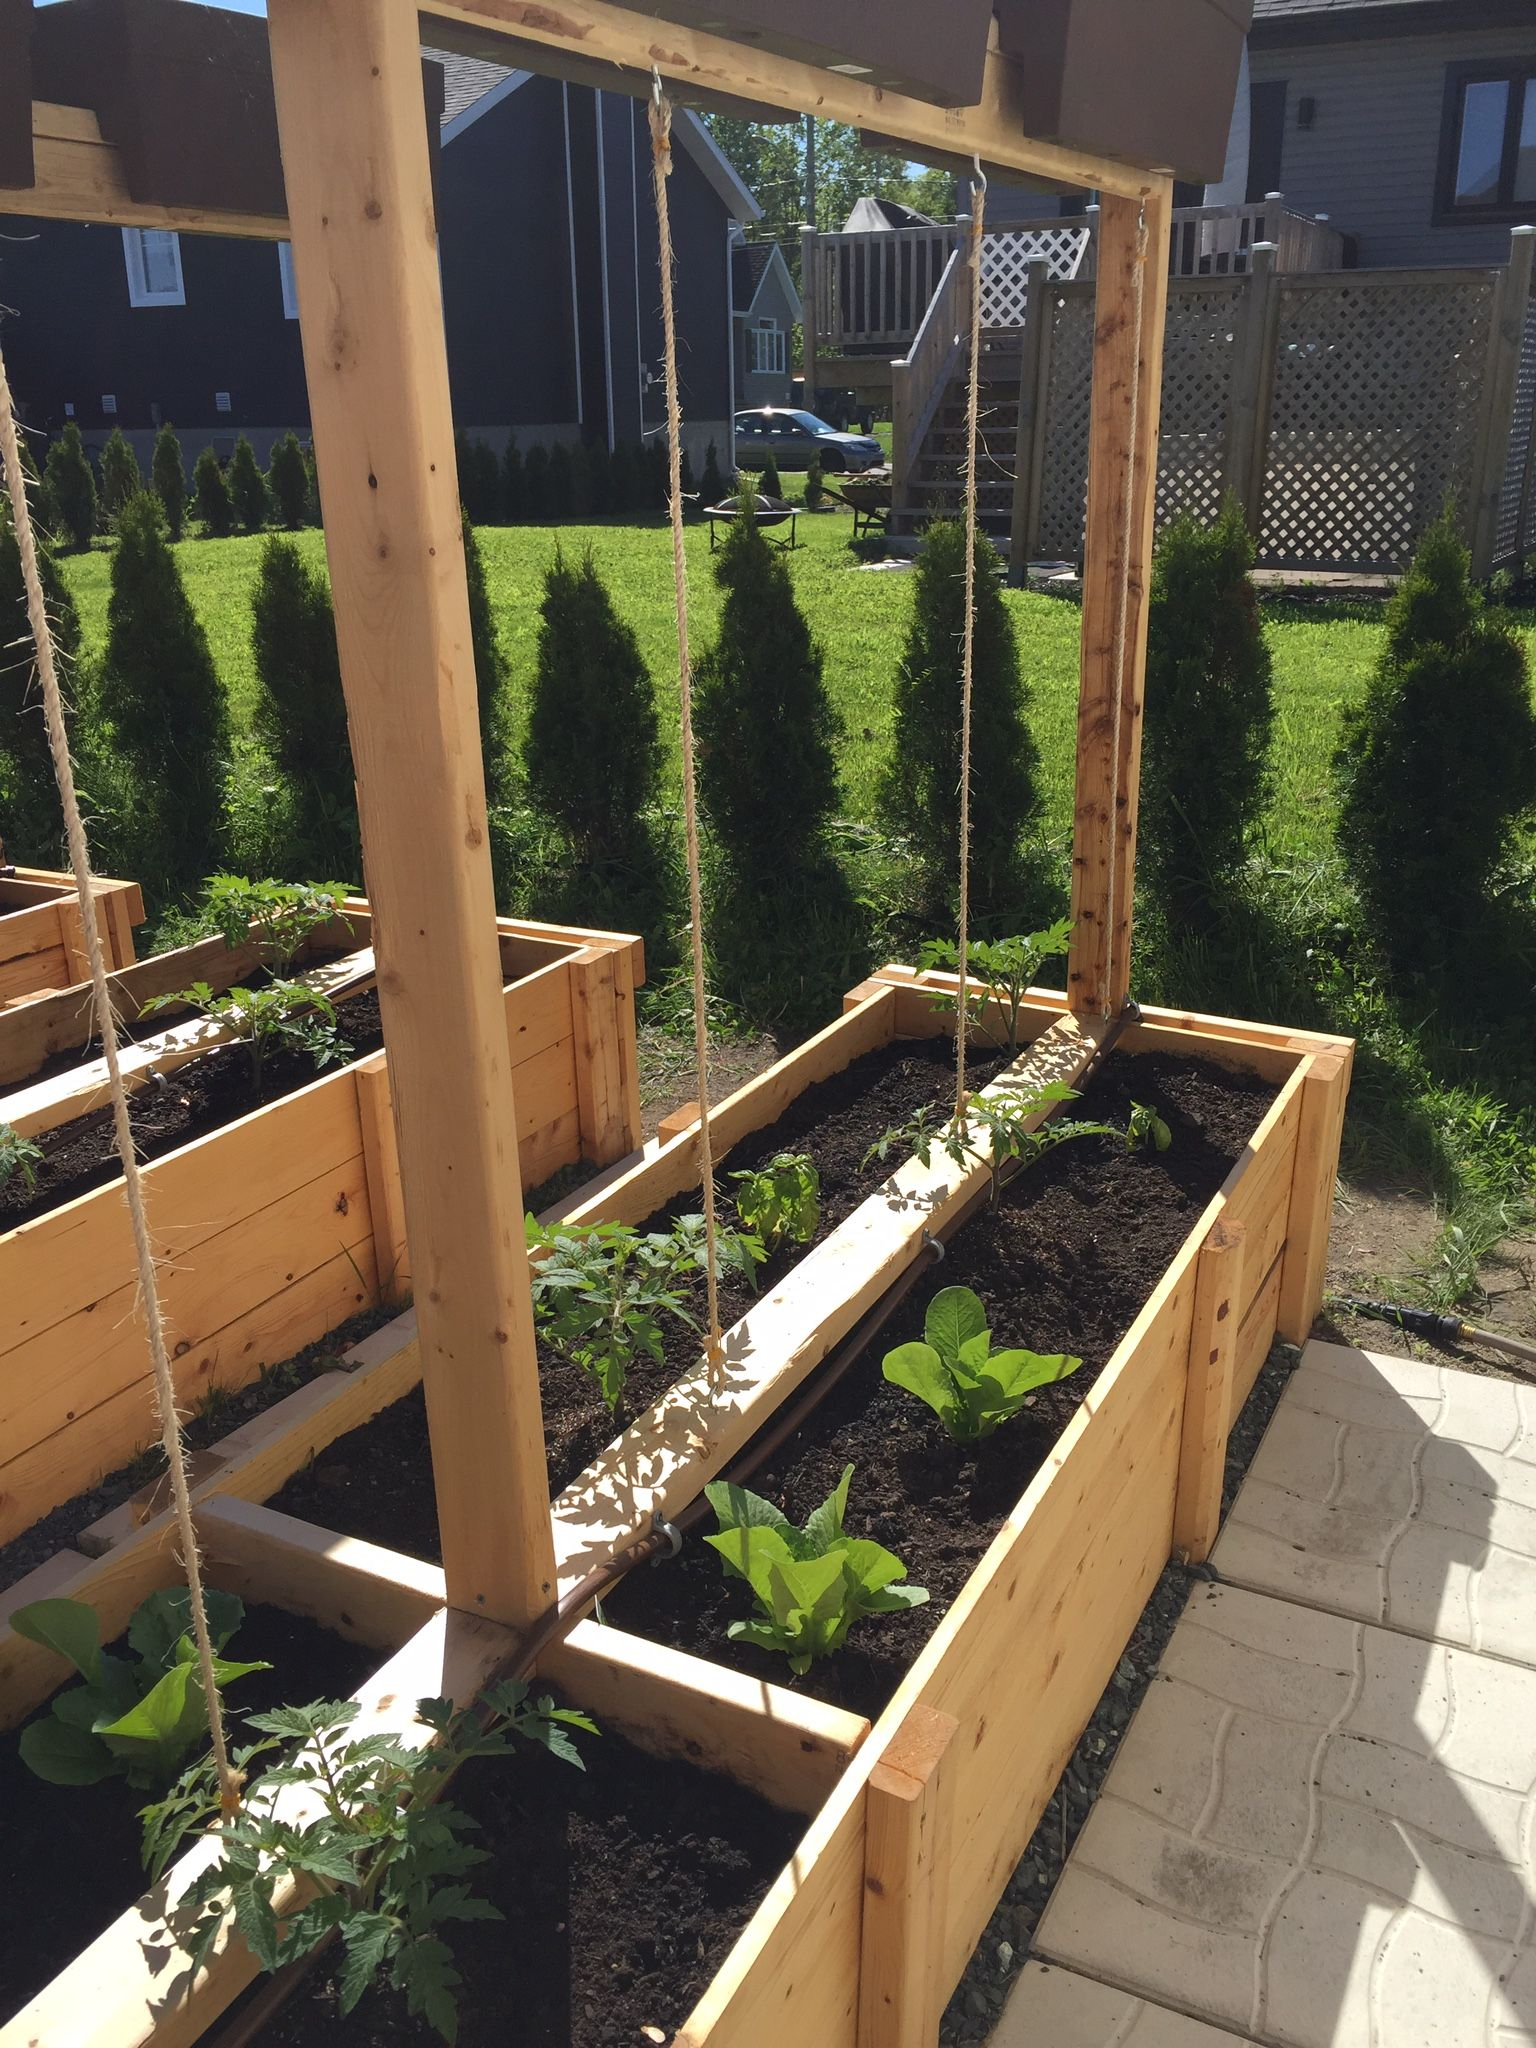 Support À Tomates | Bac Jardiniere, Bac De Jardinage, Jardin ... avec Bac De Jardin En Bois